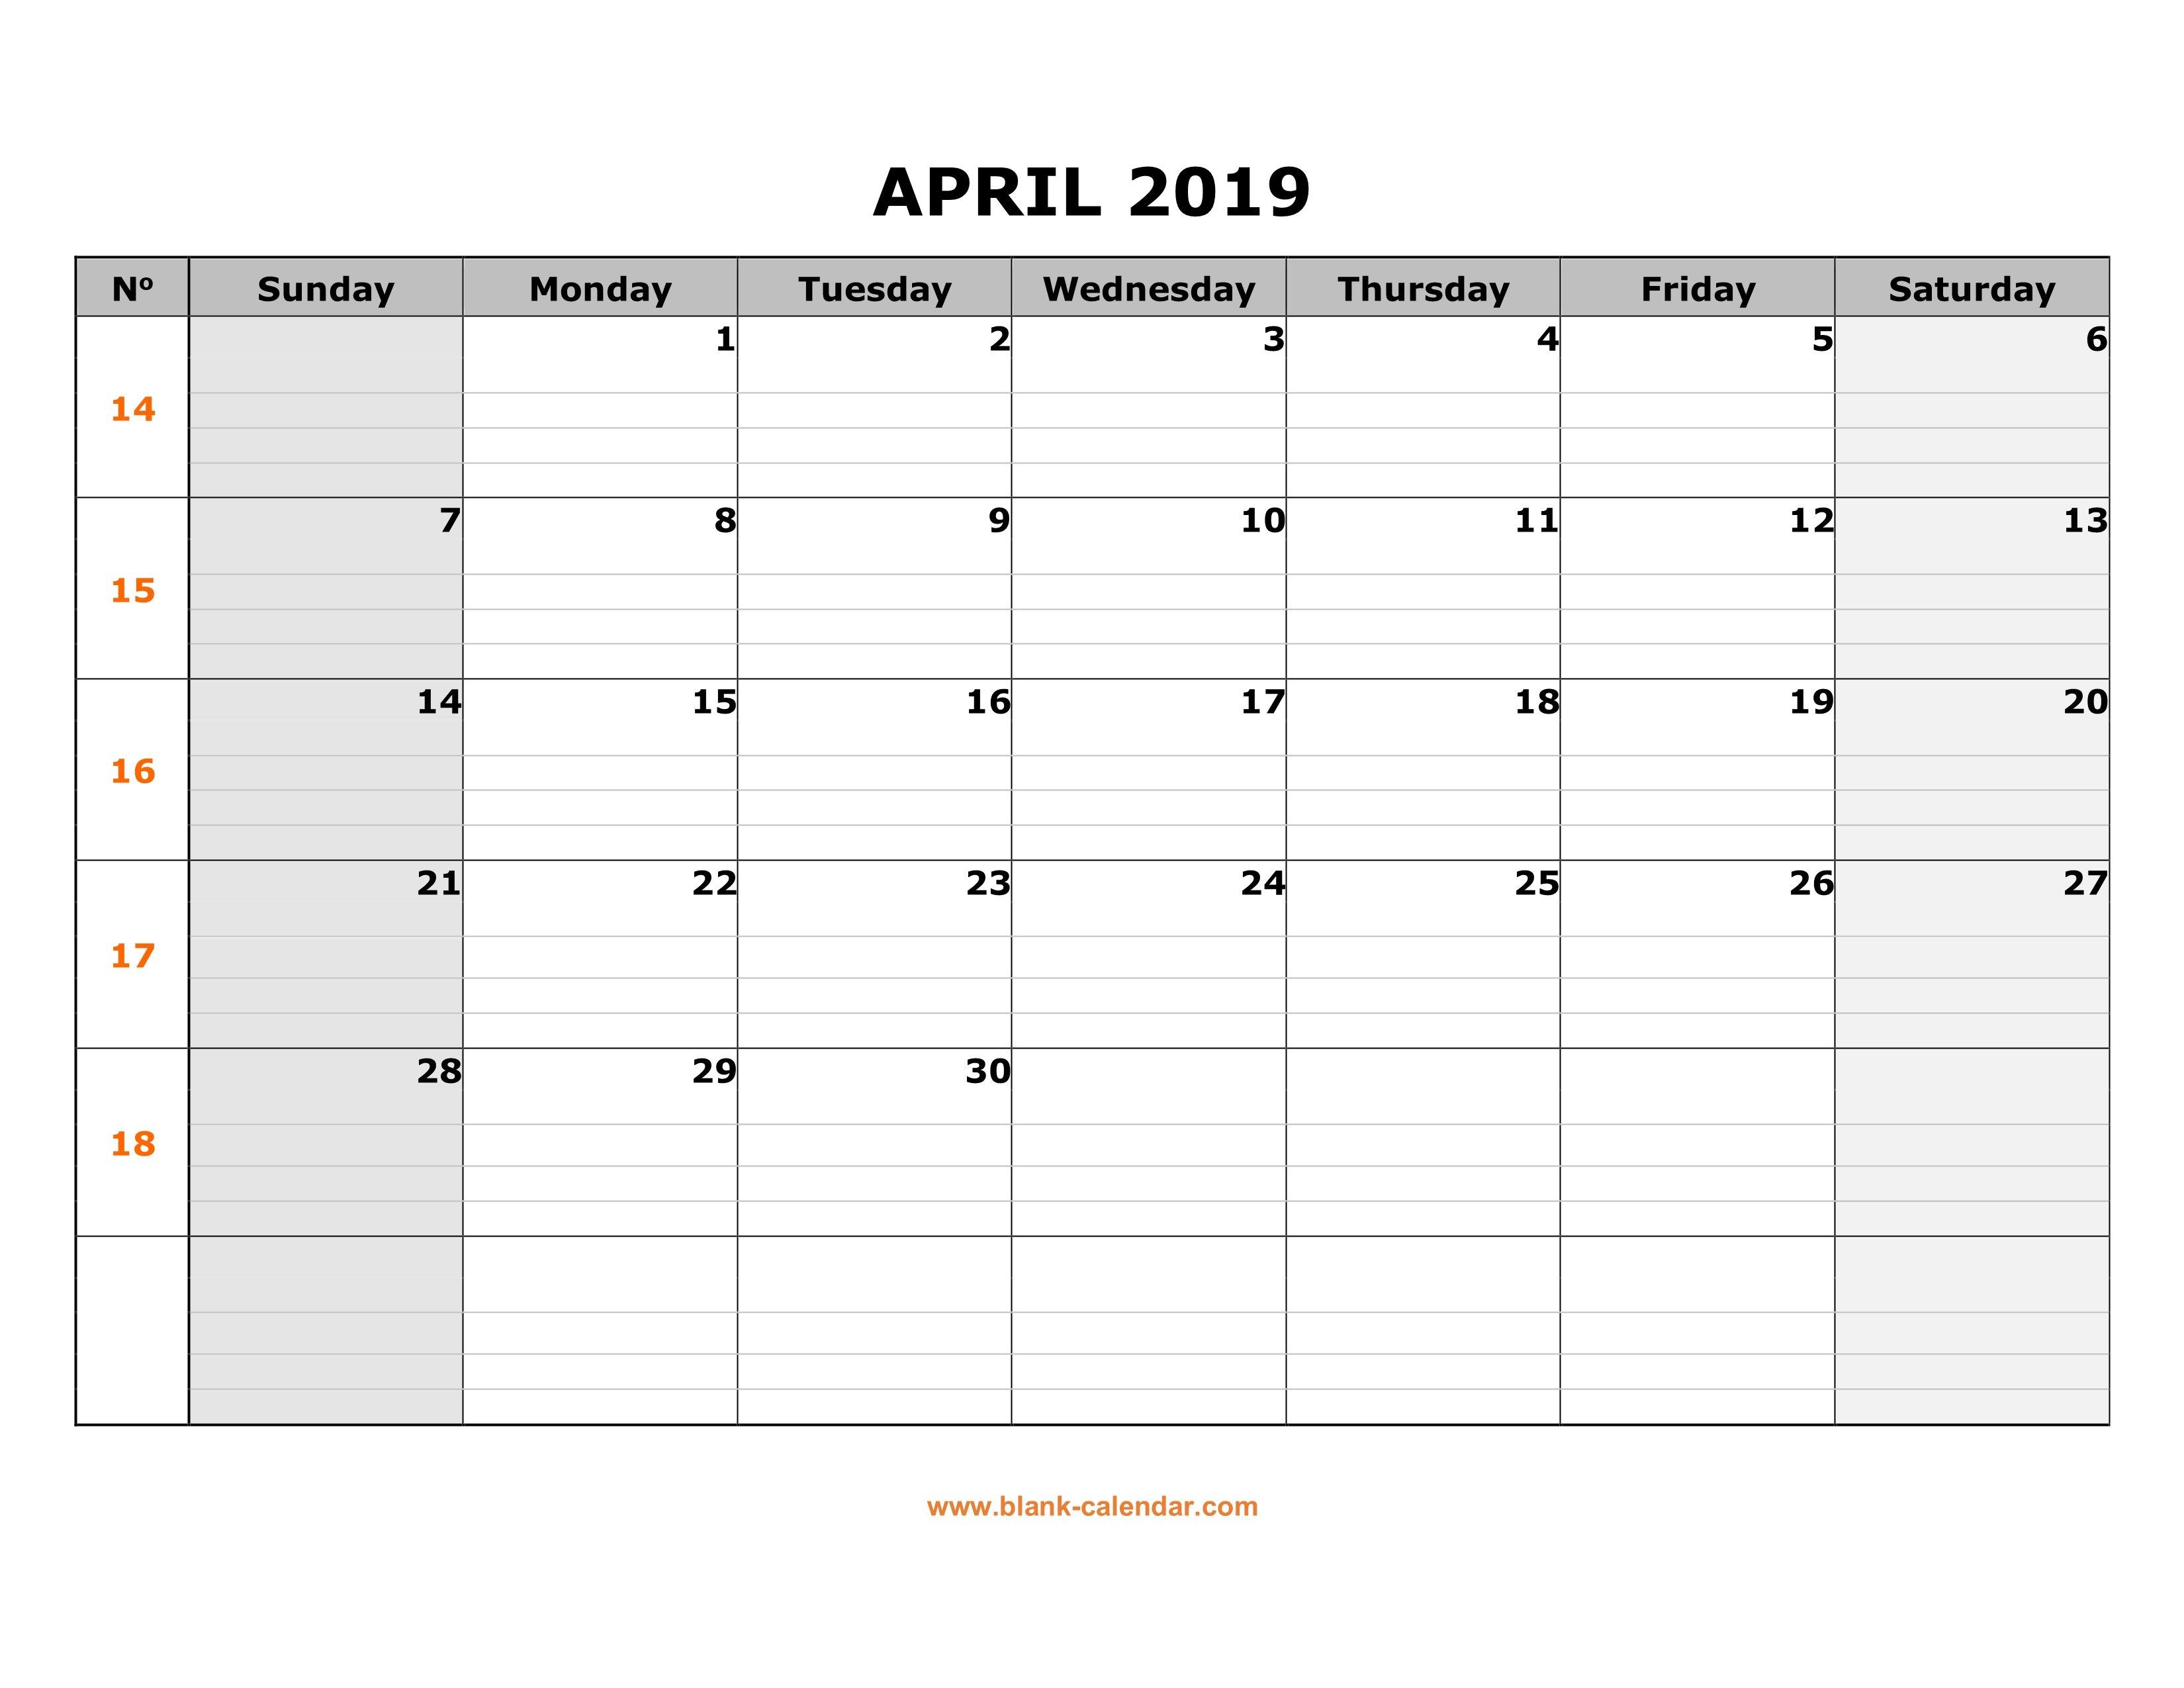 Free Download Printable April 2019 Calendar, Large Box Grid, Space Calendar 2019 With Lines